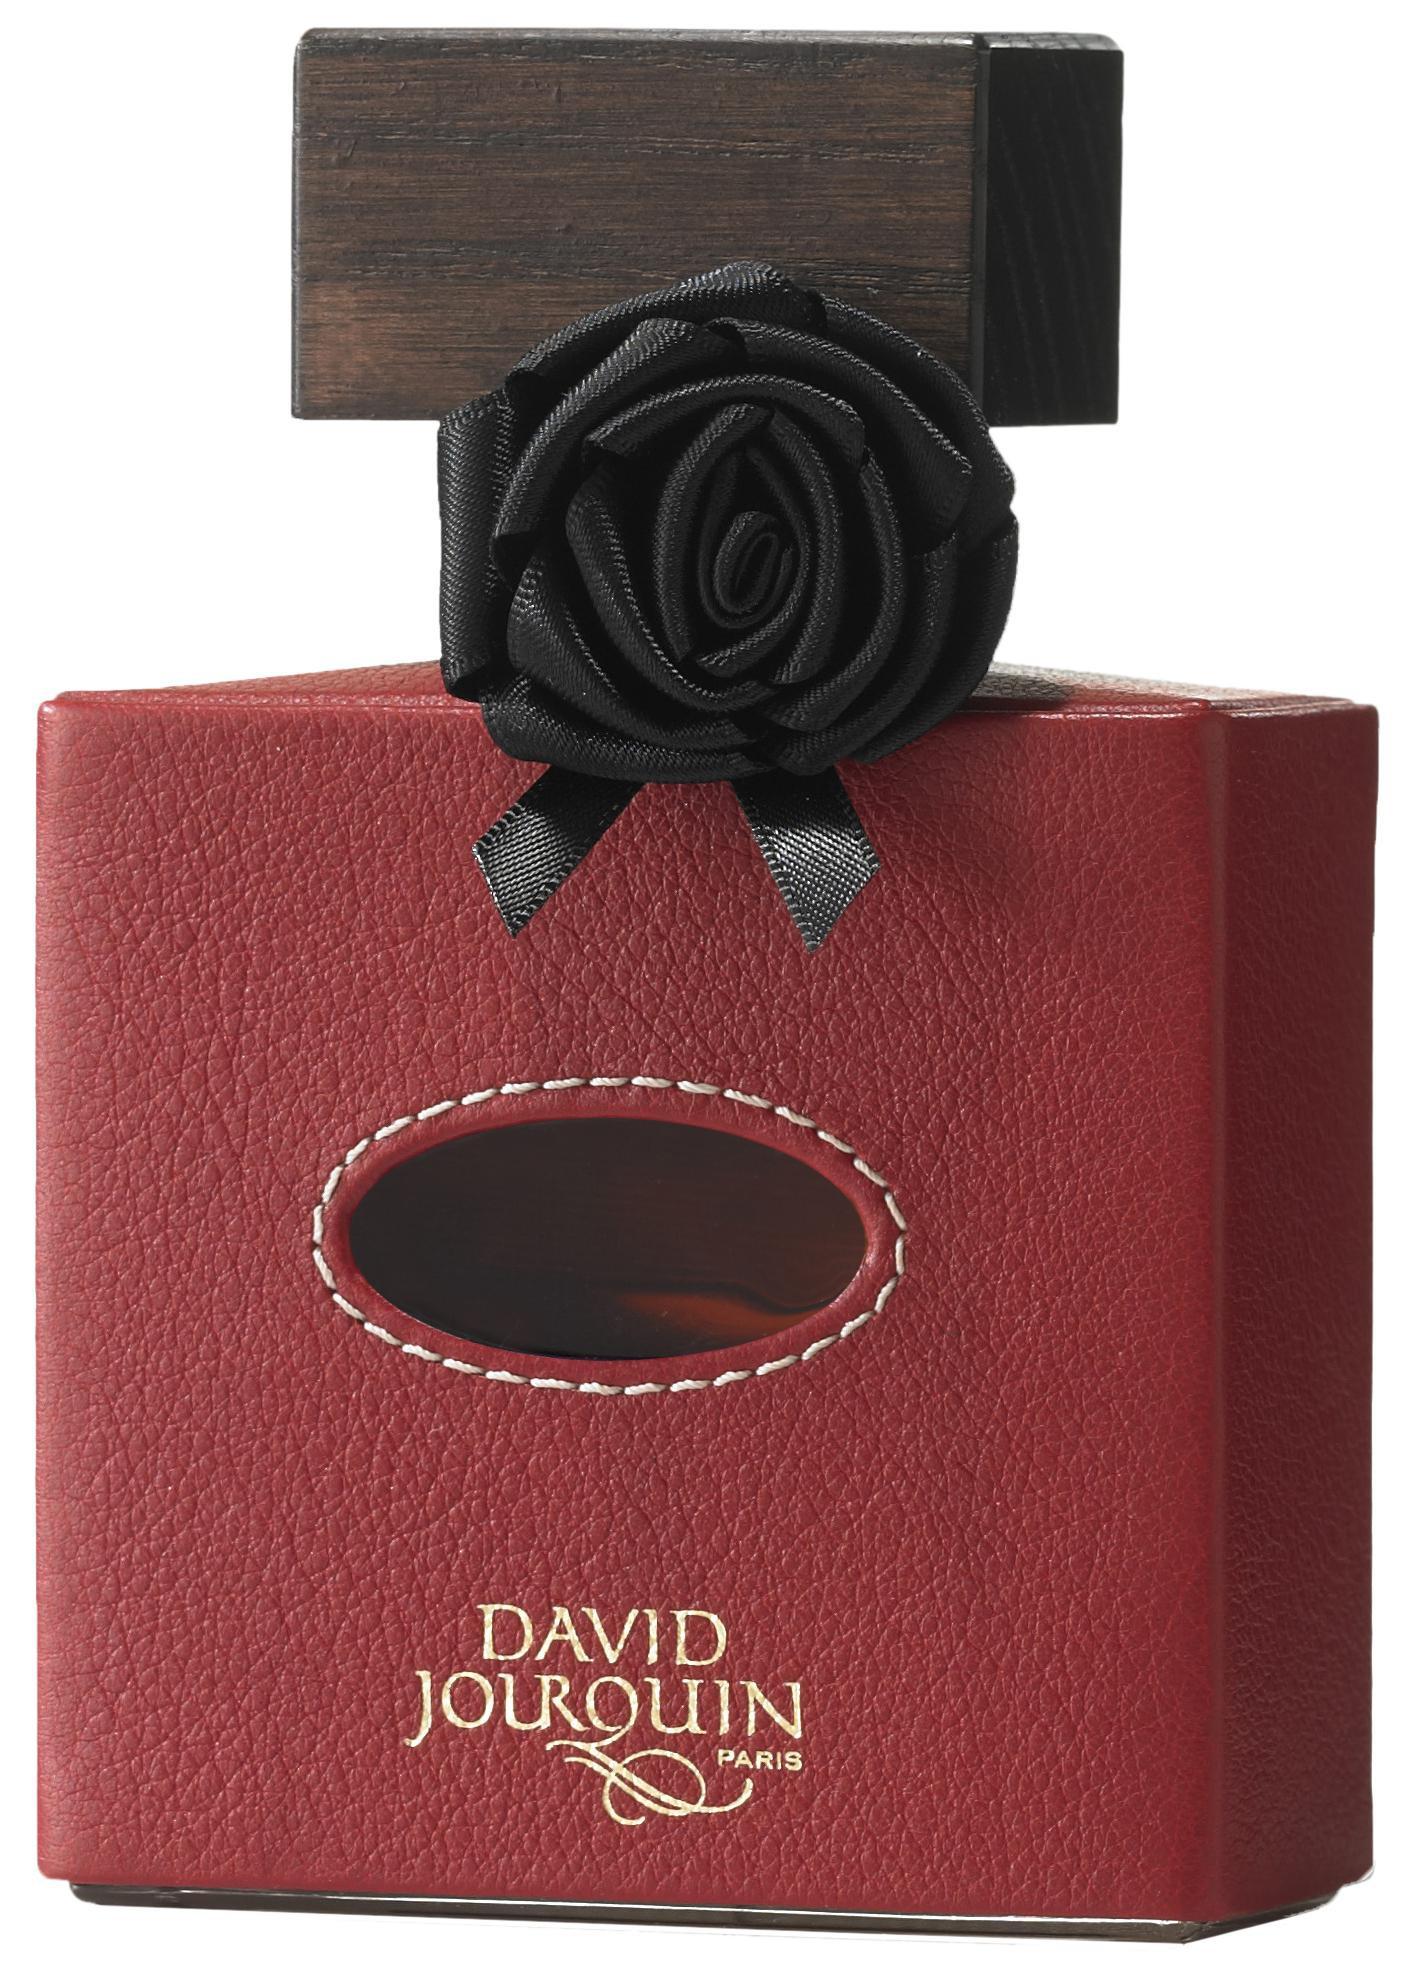 David Jourquin Cuir De R'eve аромат для женщин